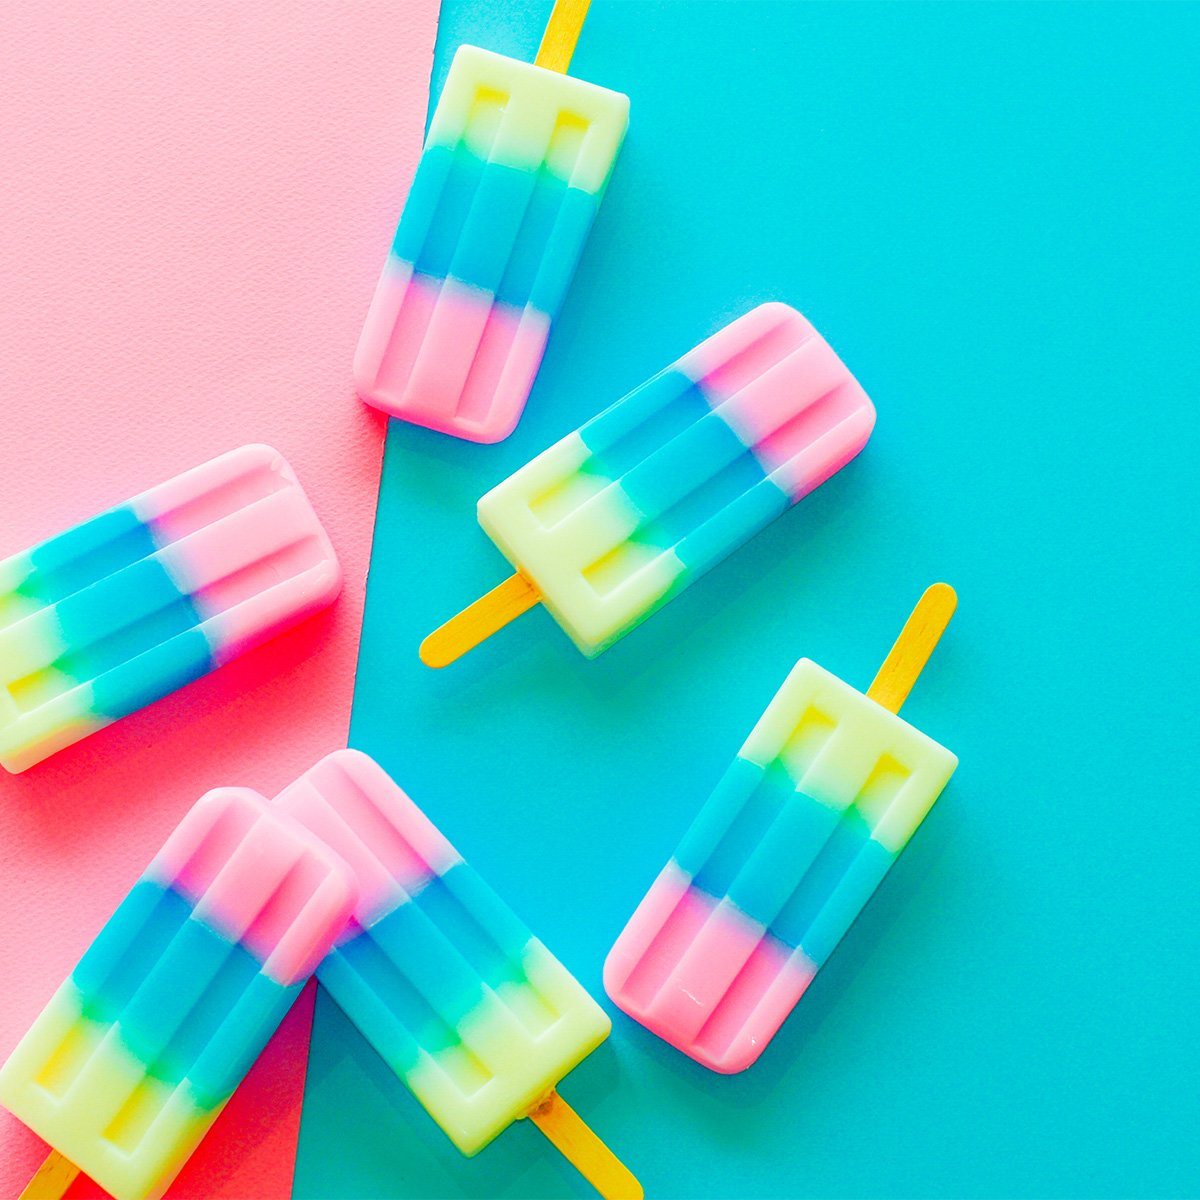 inner_ice_creams_01